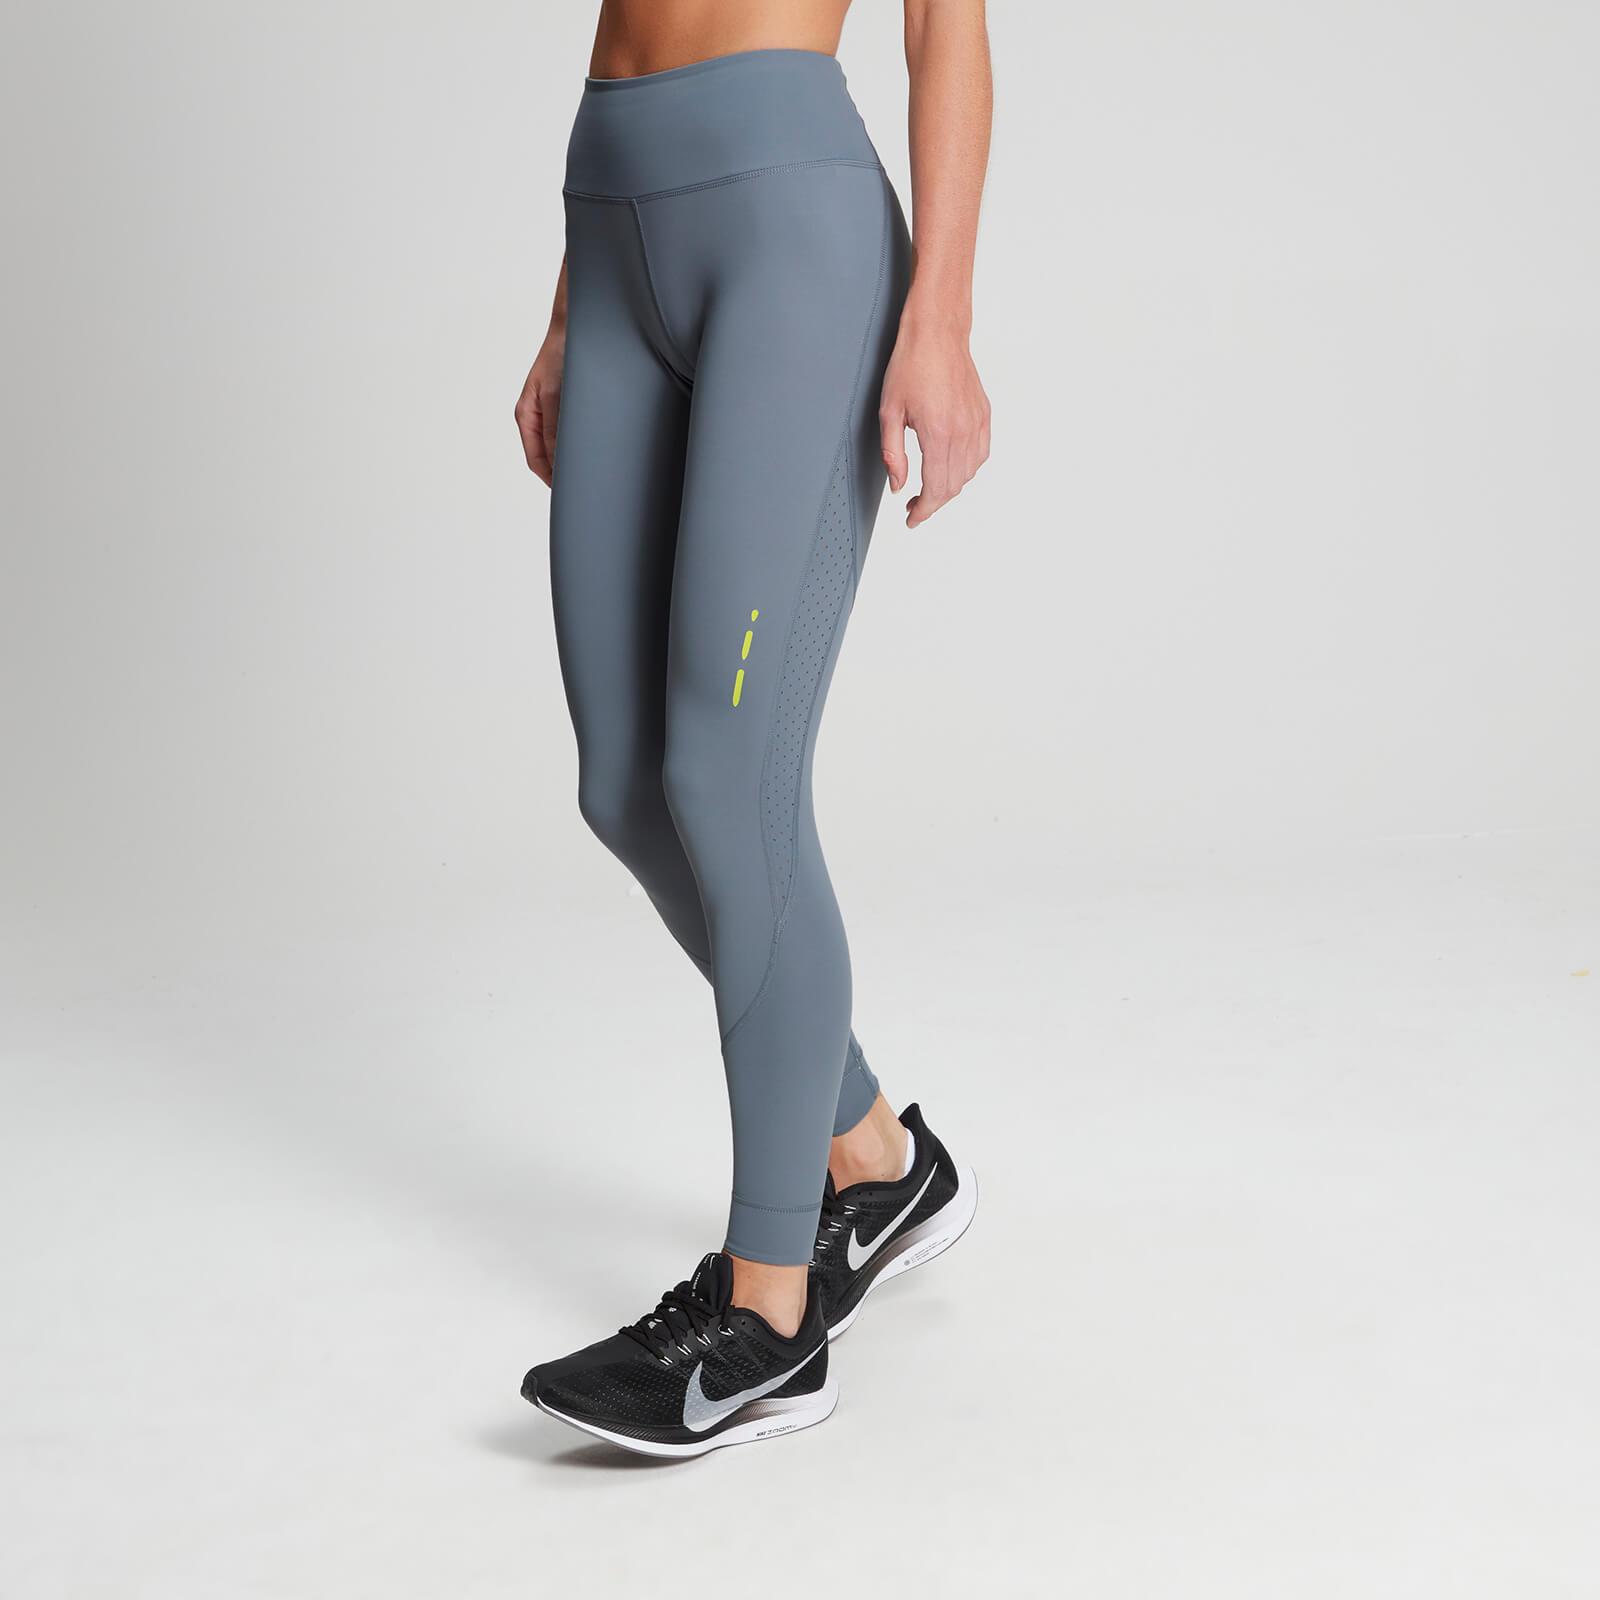 Legging Power Ultra – Galaxie/Citron vert - L